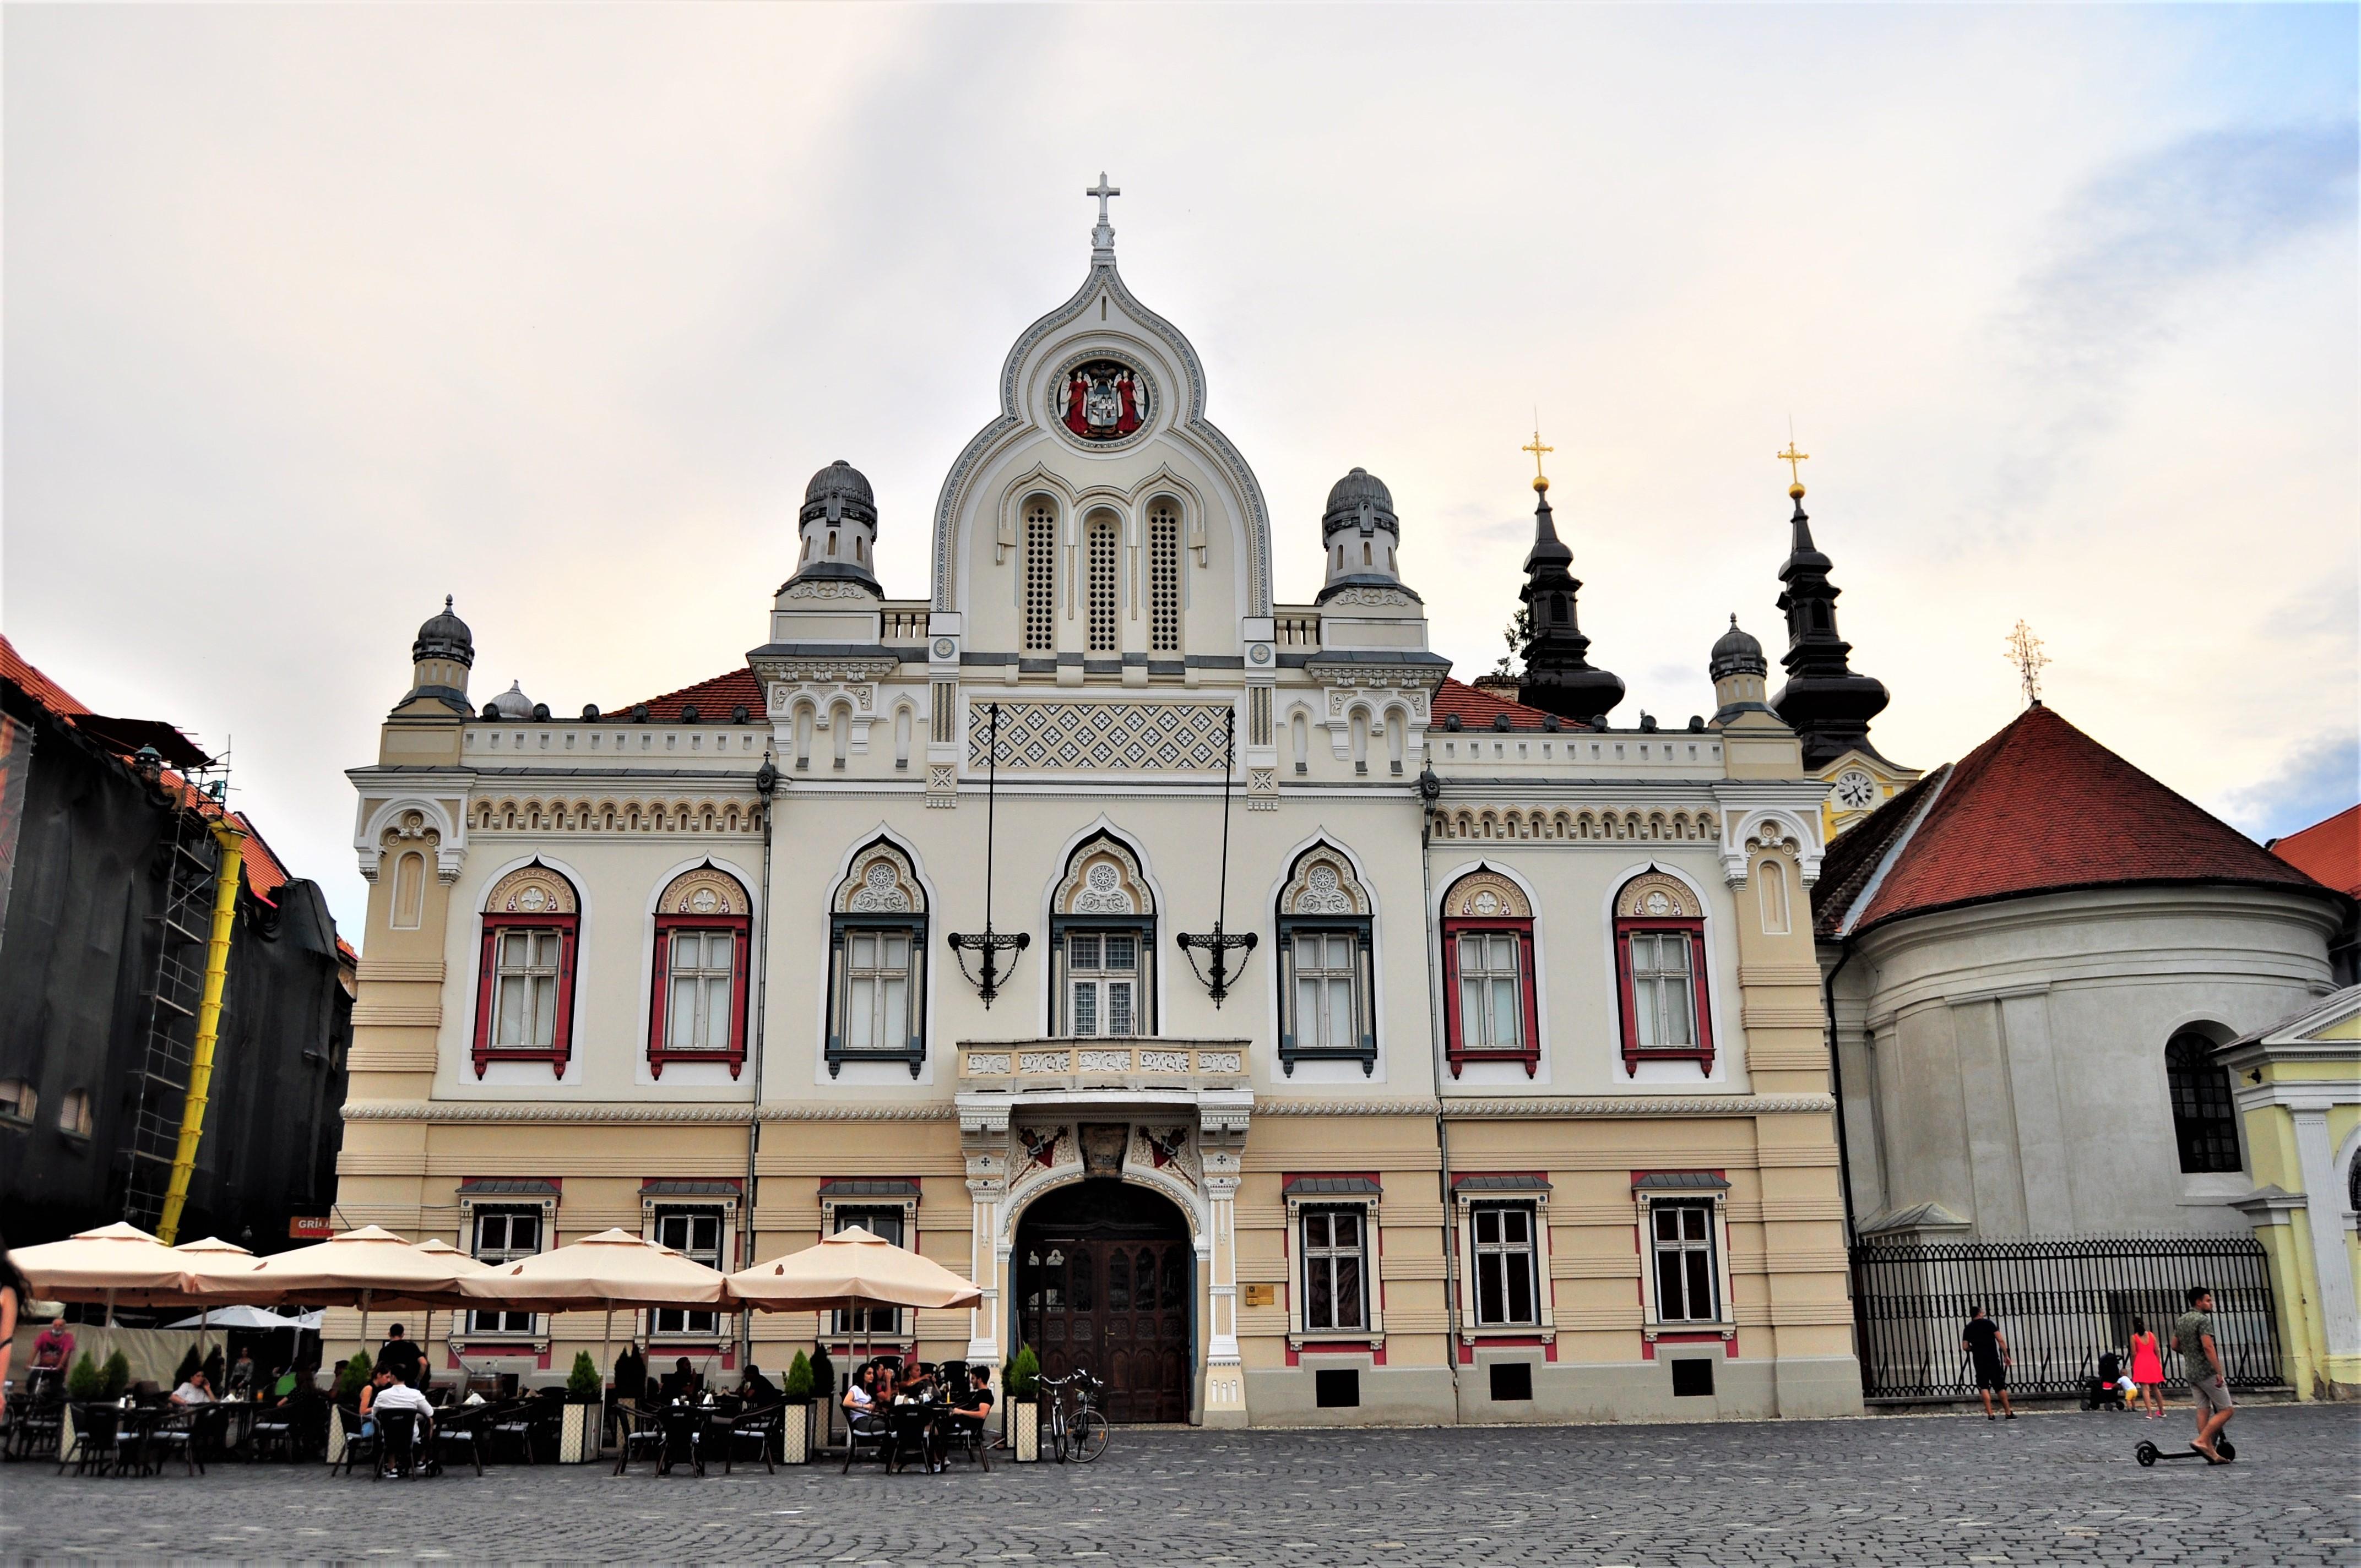 Palatul Episcopiei Ortodoxe. Timișoara.